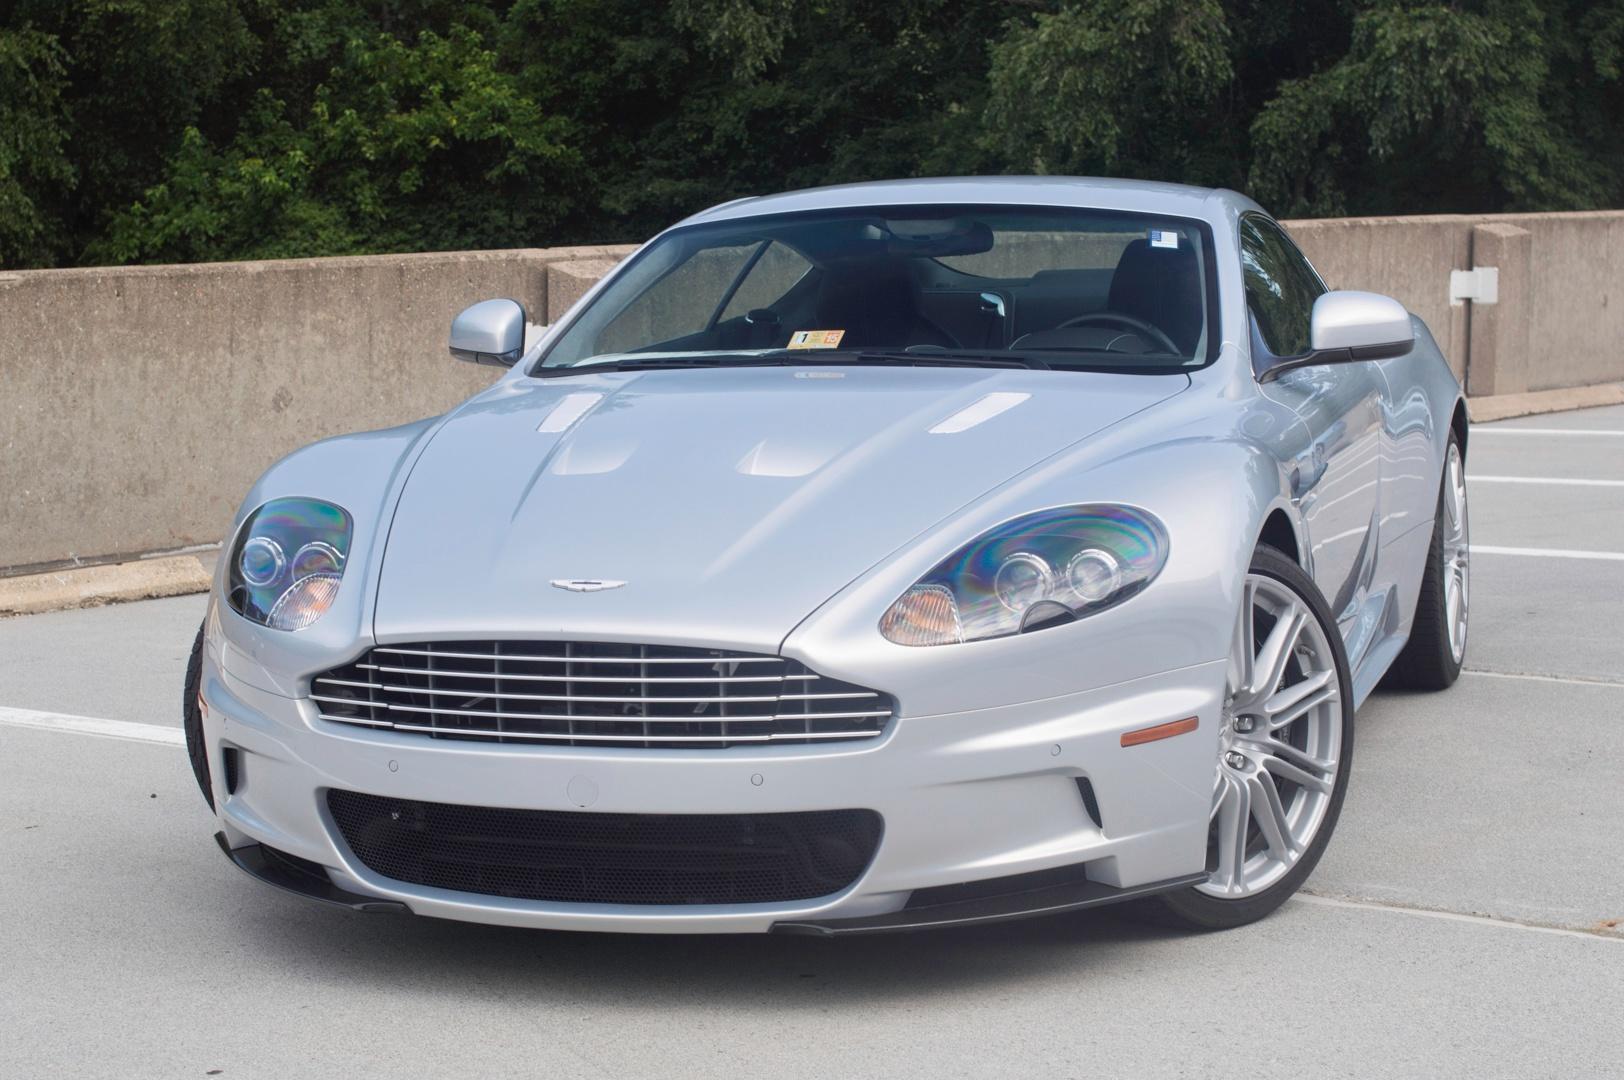 Aston Martin DBS Stock NE For Sale Near Vienna VA VA - Aston martin dbs for sale